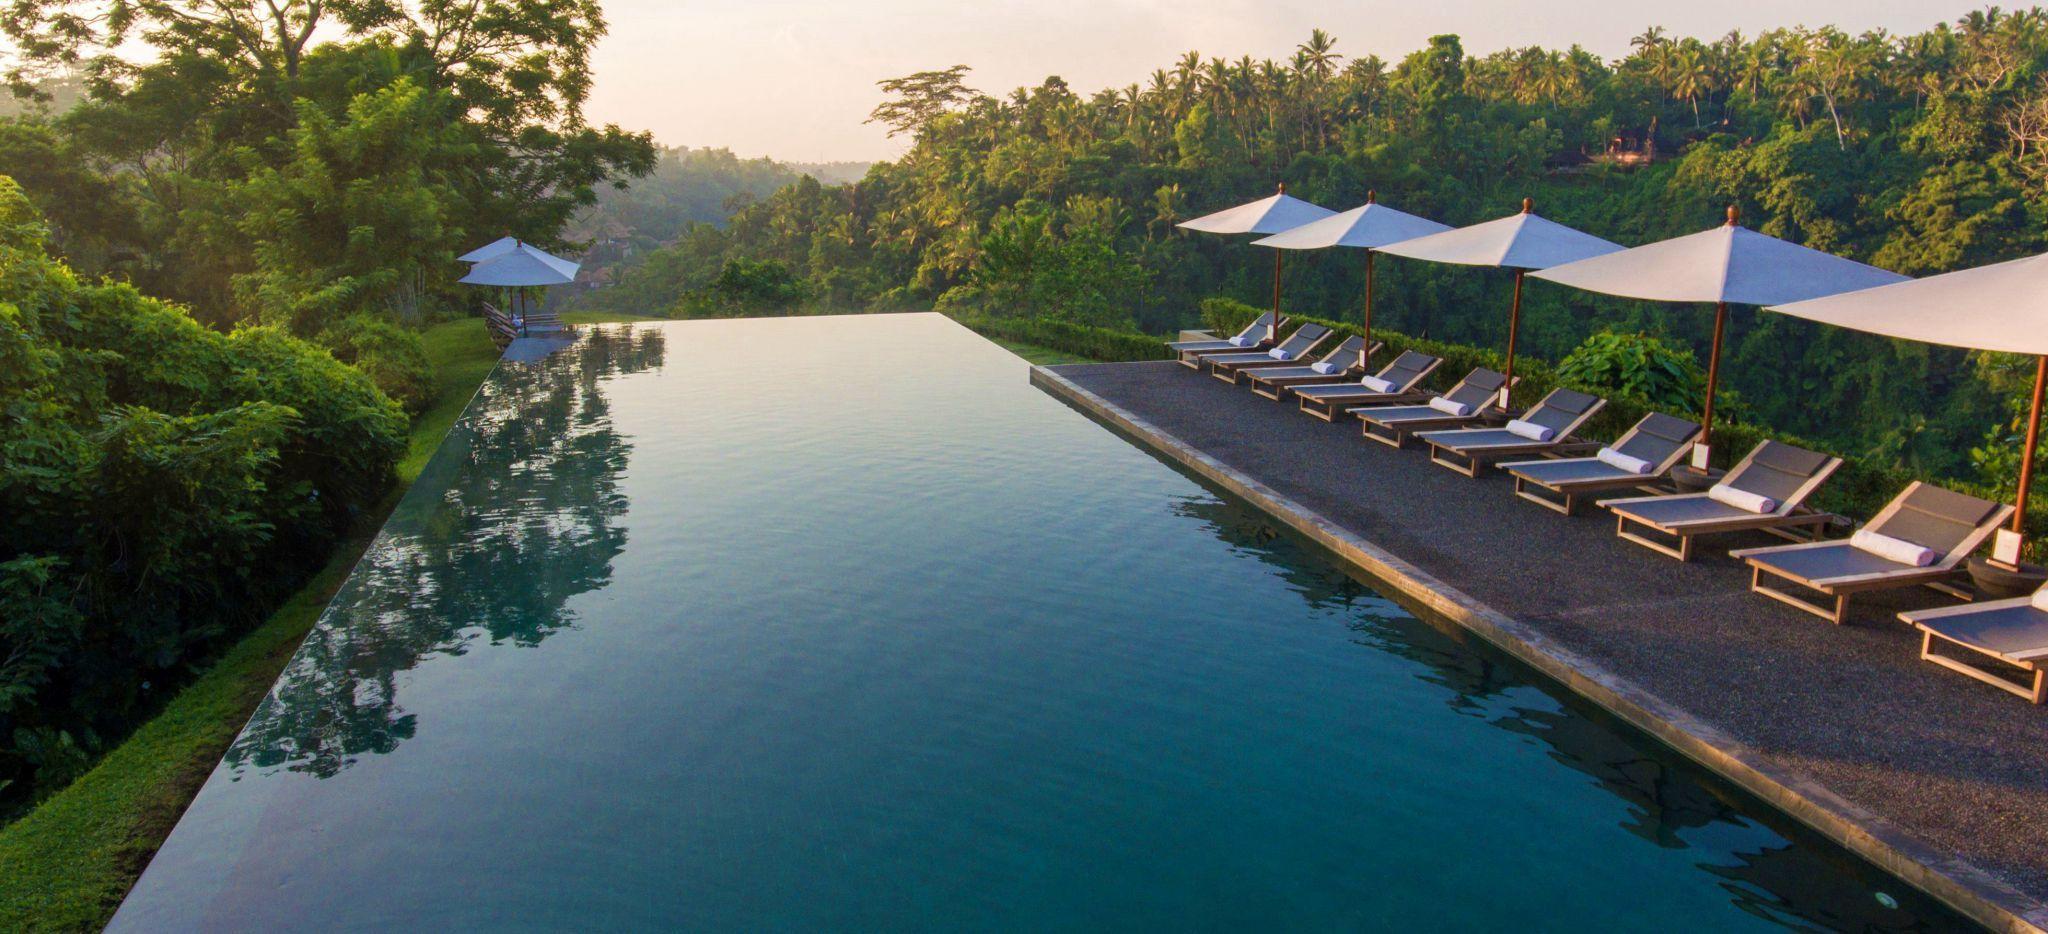 Infinity Pool des Alila Ubud, mit Strandliegen und umgebendem grün